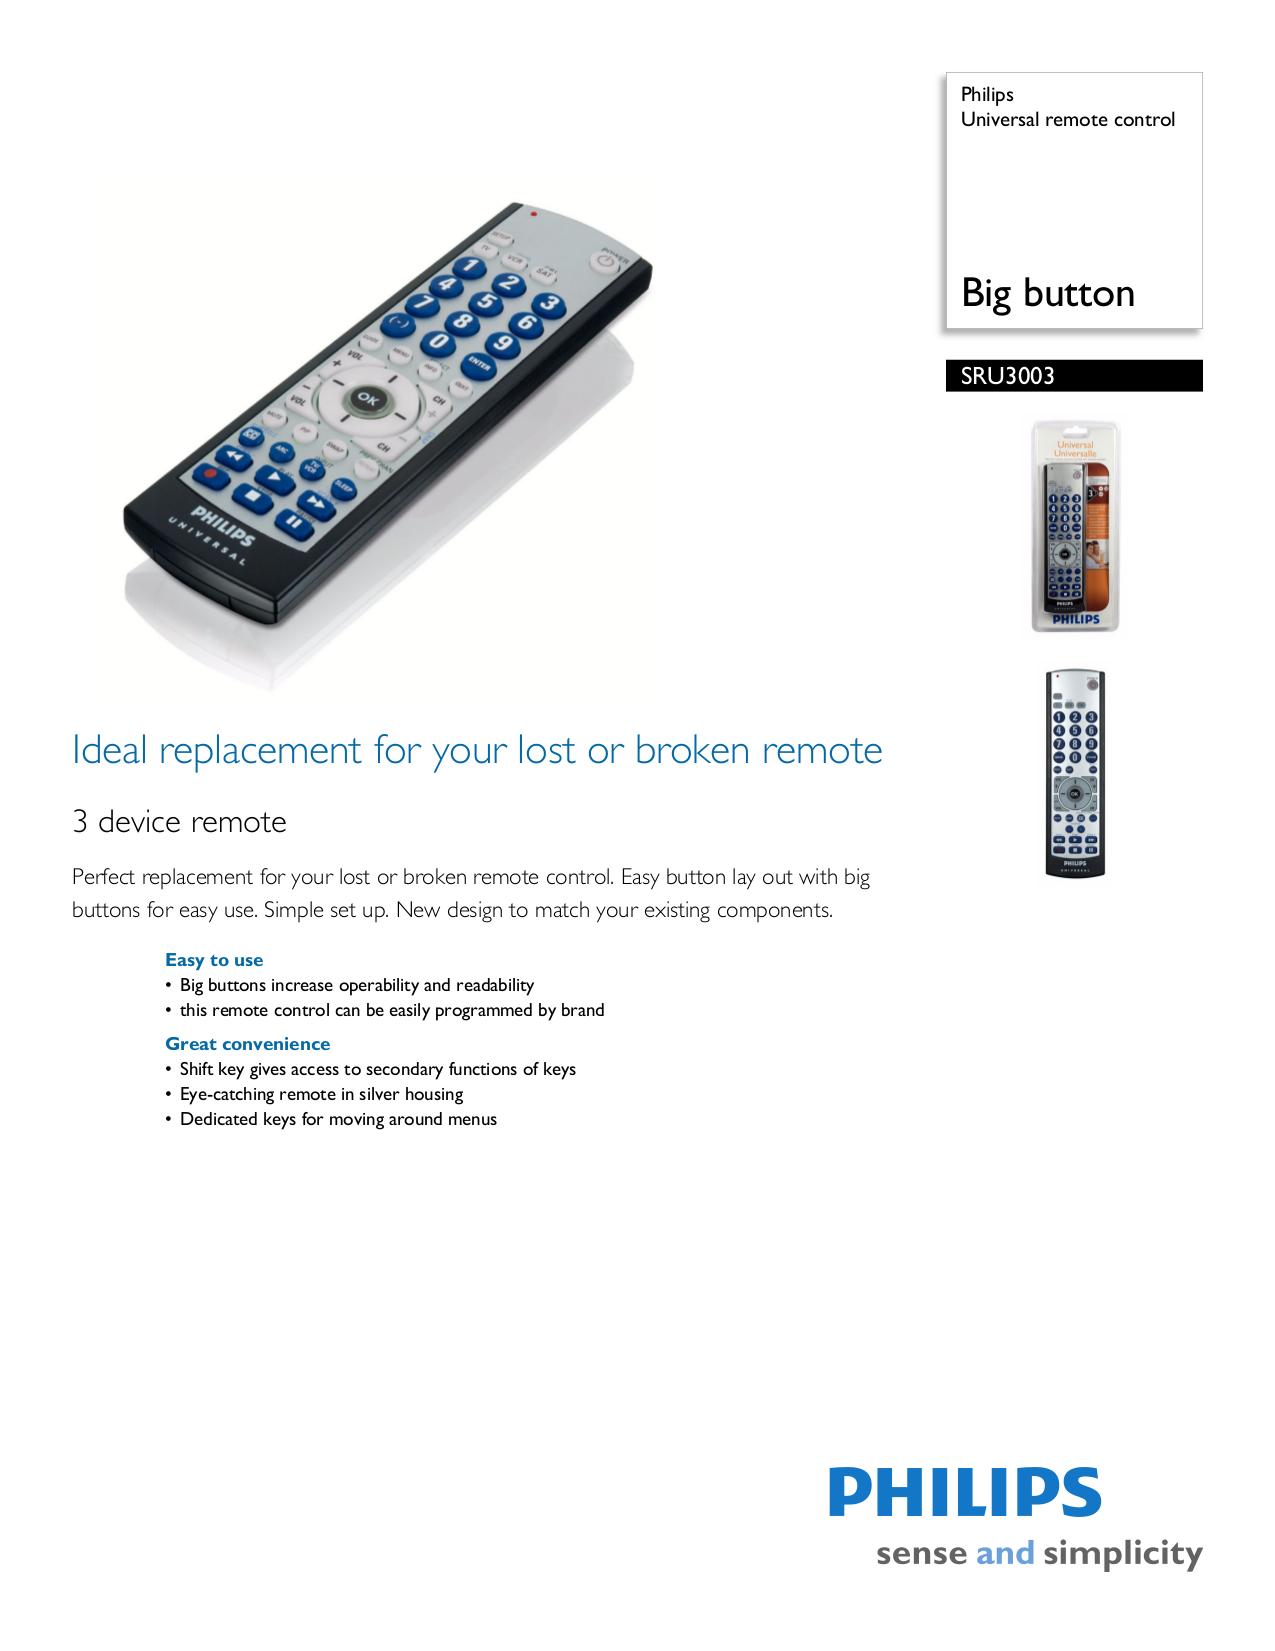 download free pdf for philips sru3003 remote control manual rh umlib com philips universal remote control sru3003wm 17 manual Philips Universal Remote Television Codes